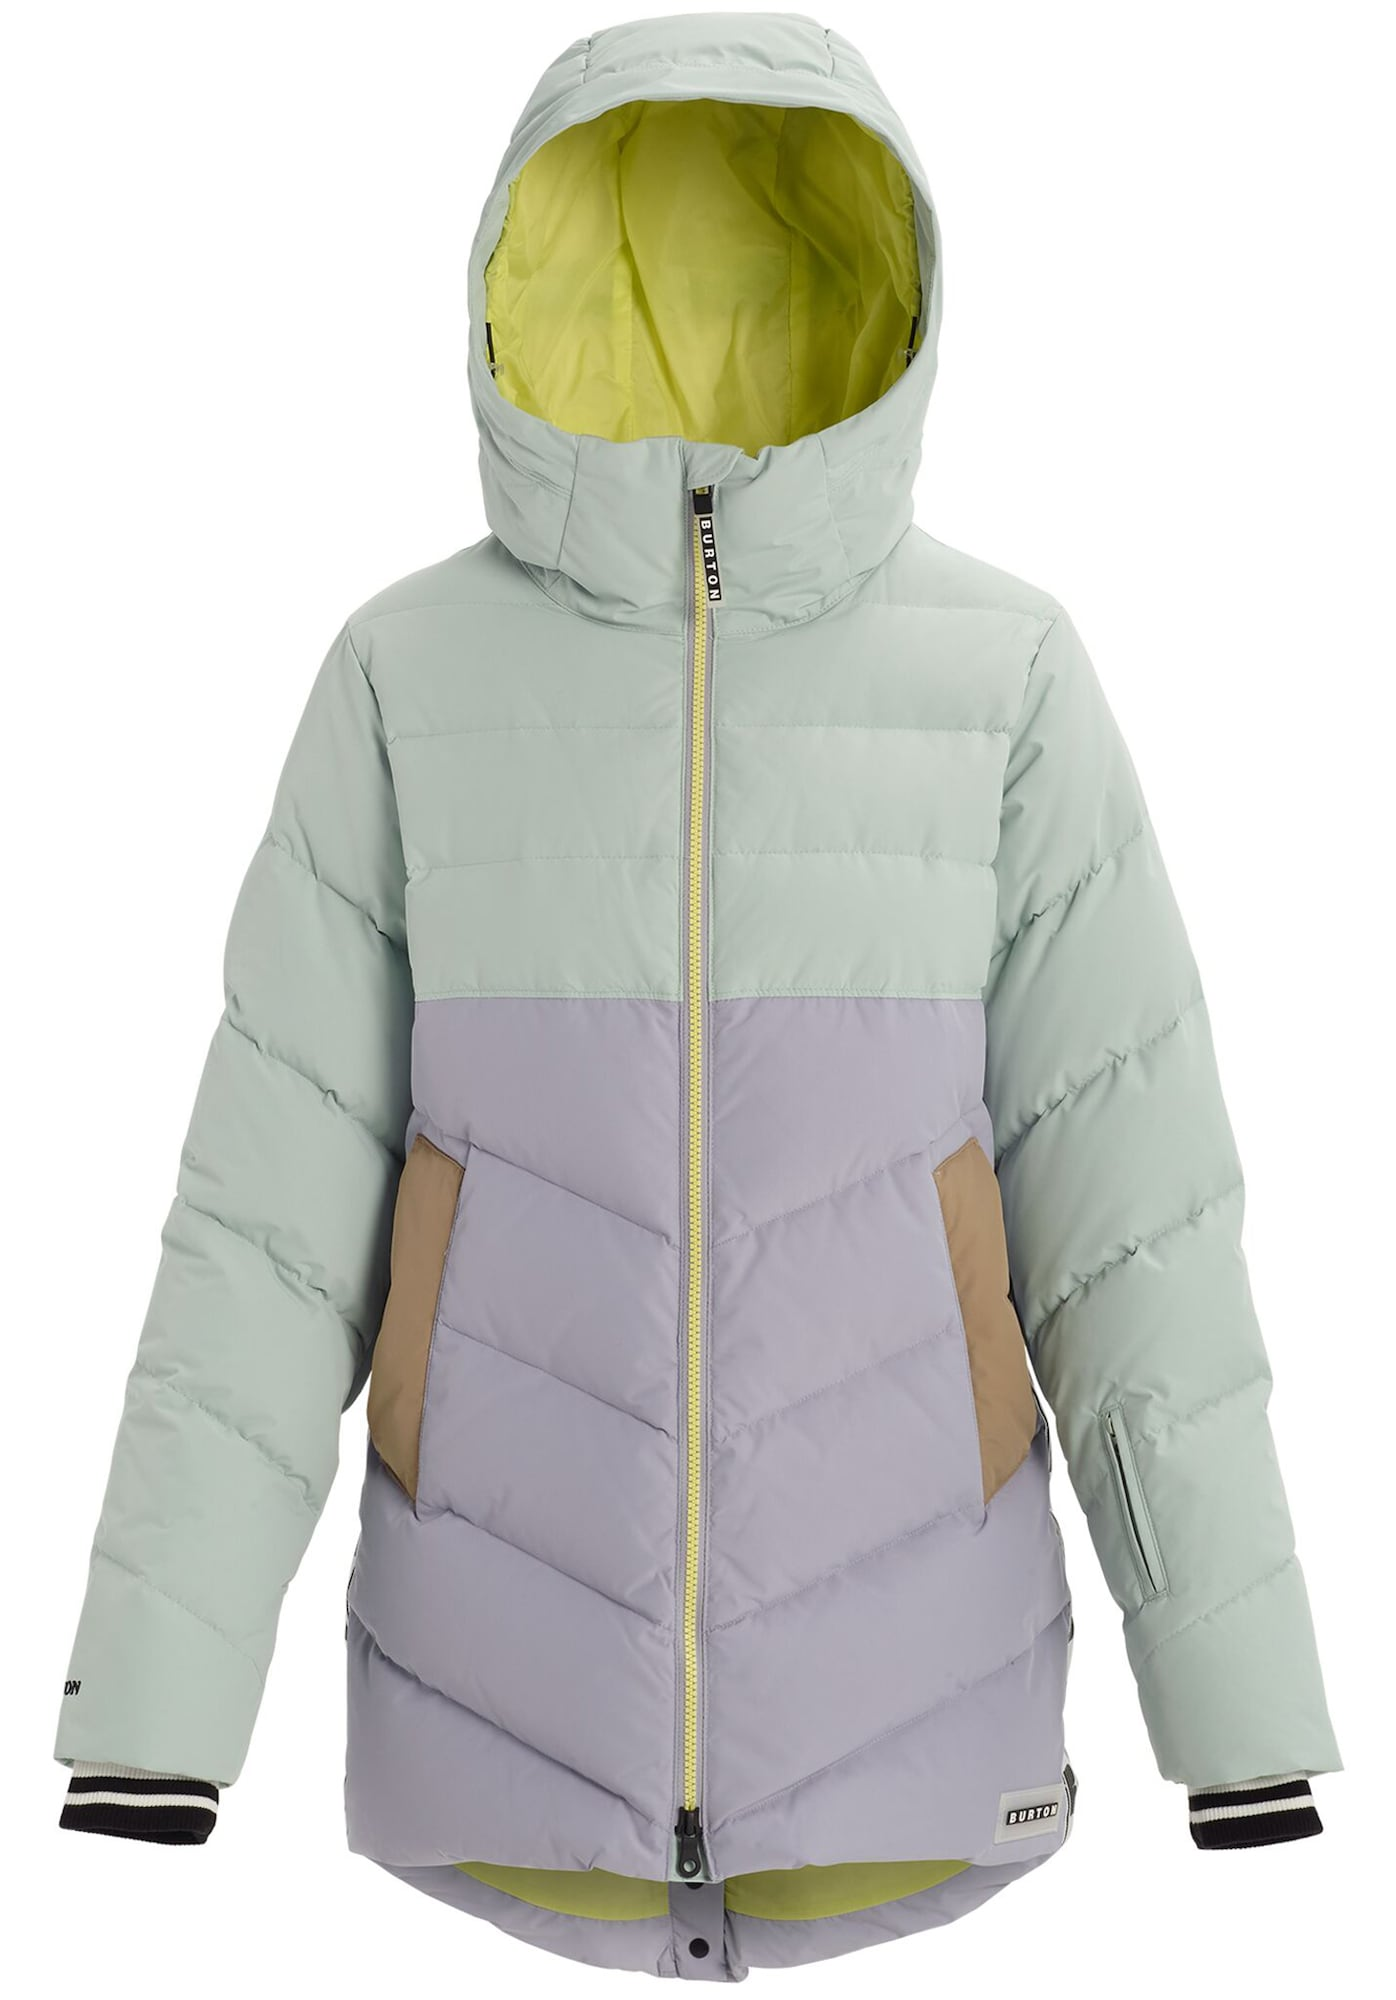 Snowboardjacke 'Loyle' | Sportbekleidung > Sportjacken > Snowboardjacken | Burton